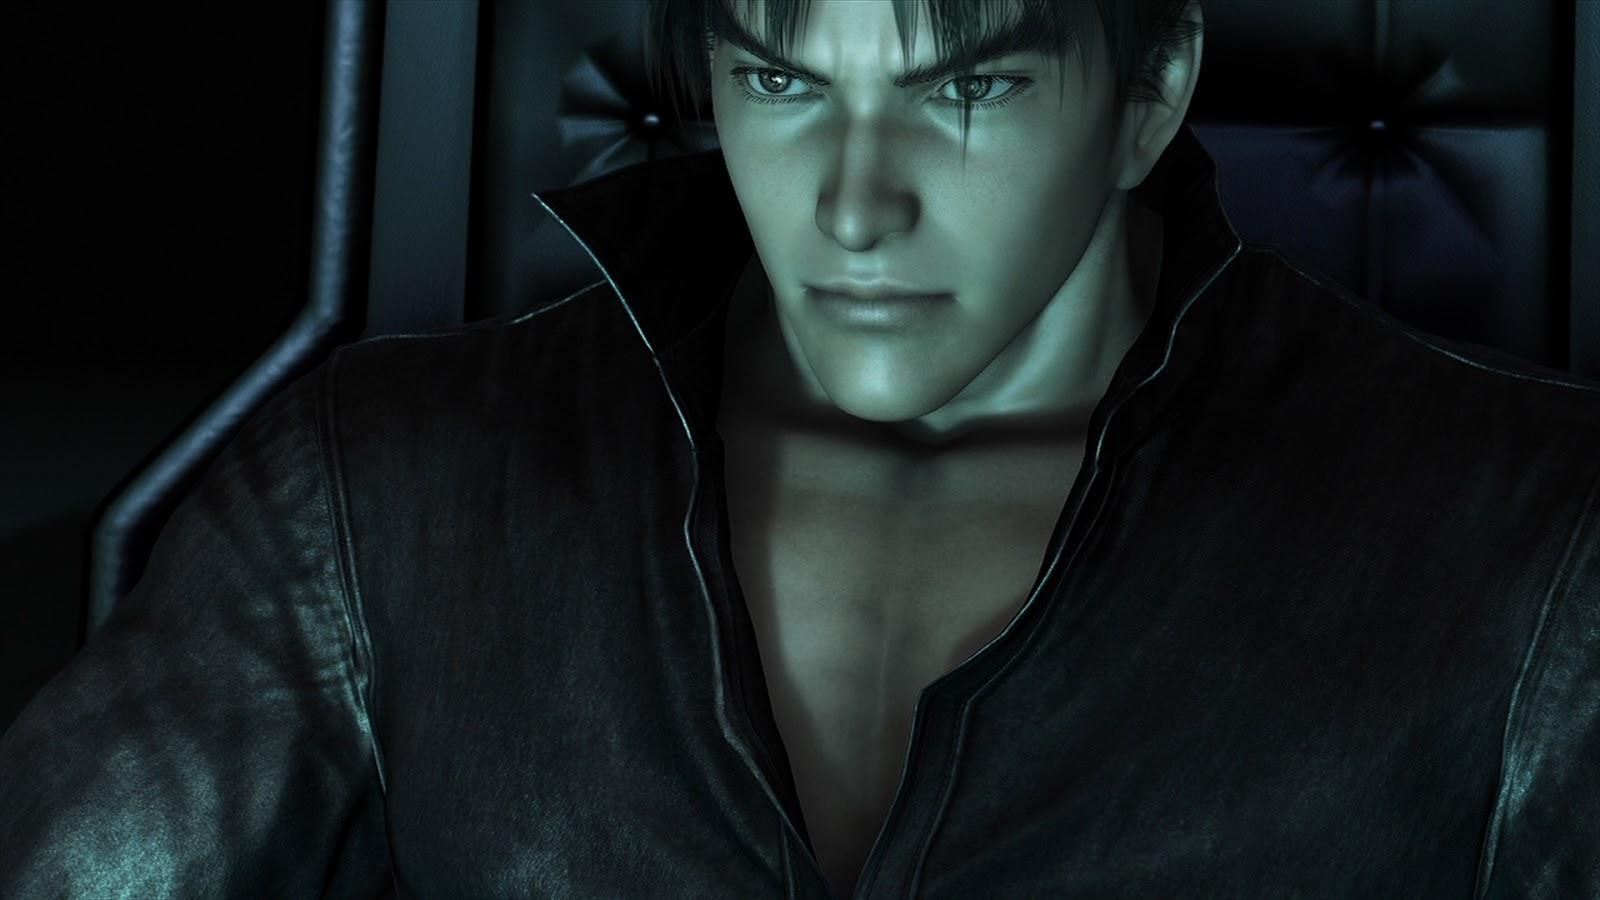 Tekken+Blood+Vengeance+%282011%29+1080p+BDRemux+-+Descargatepelis.com.mkv_snapshot_00.05.11.092.jpg (1600×900)